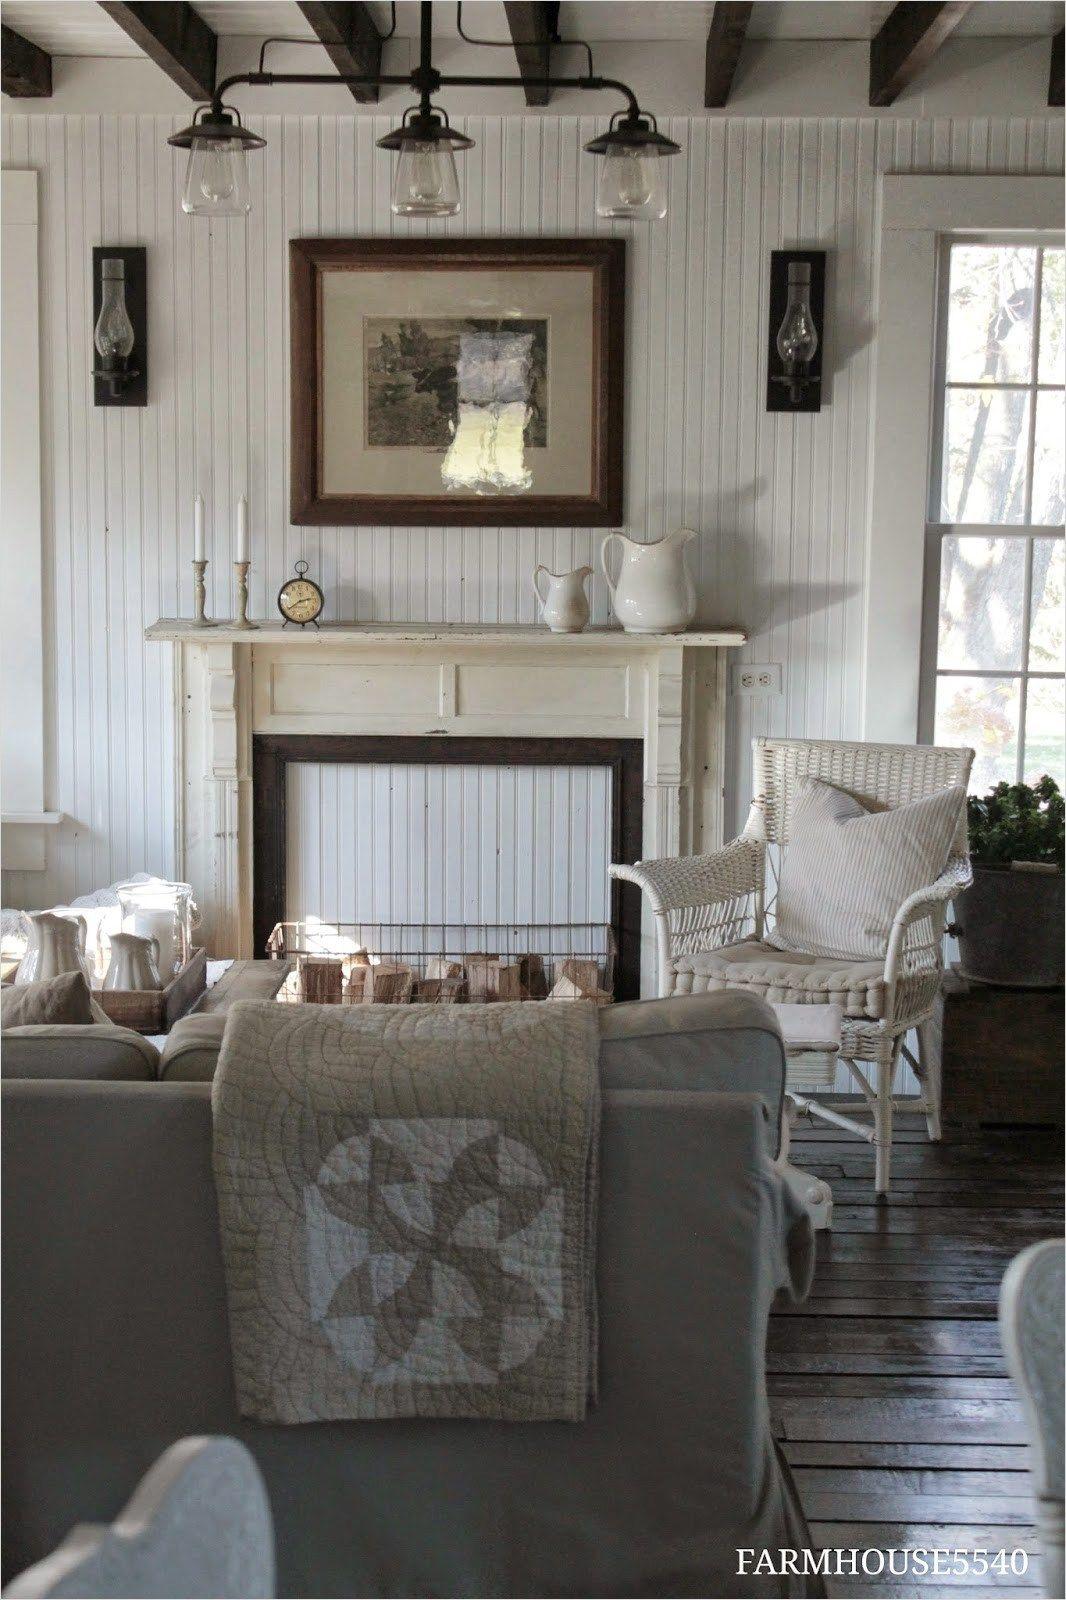 Romantic Living Room: 54 Cozy Farmhouse Romantic Living Room Ideas